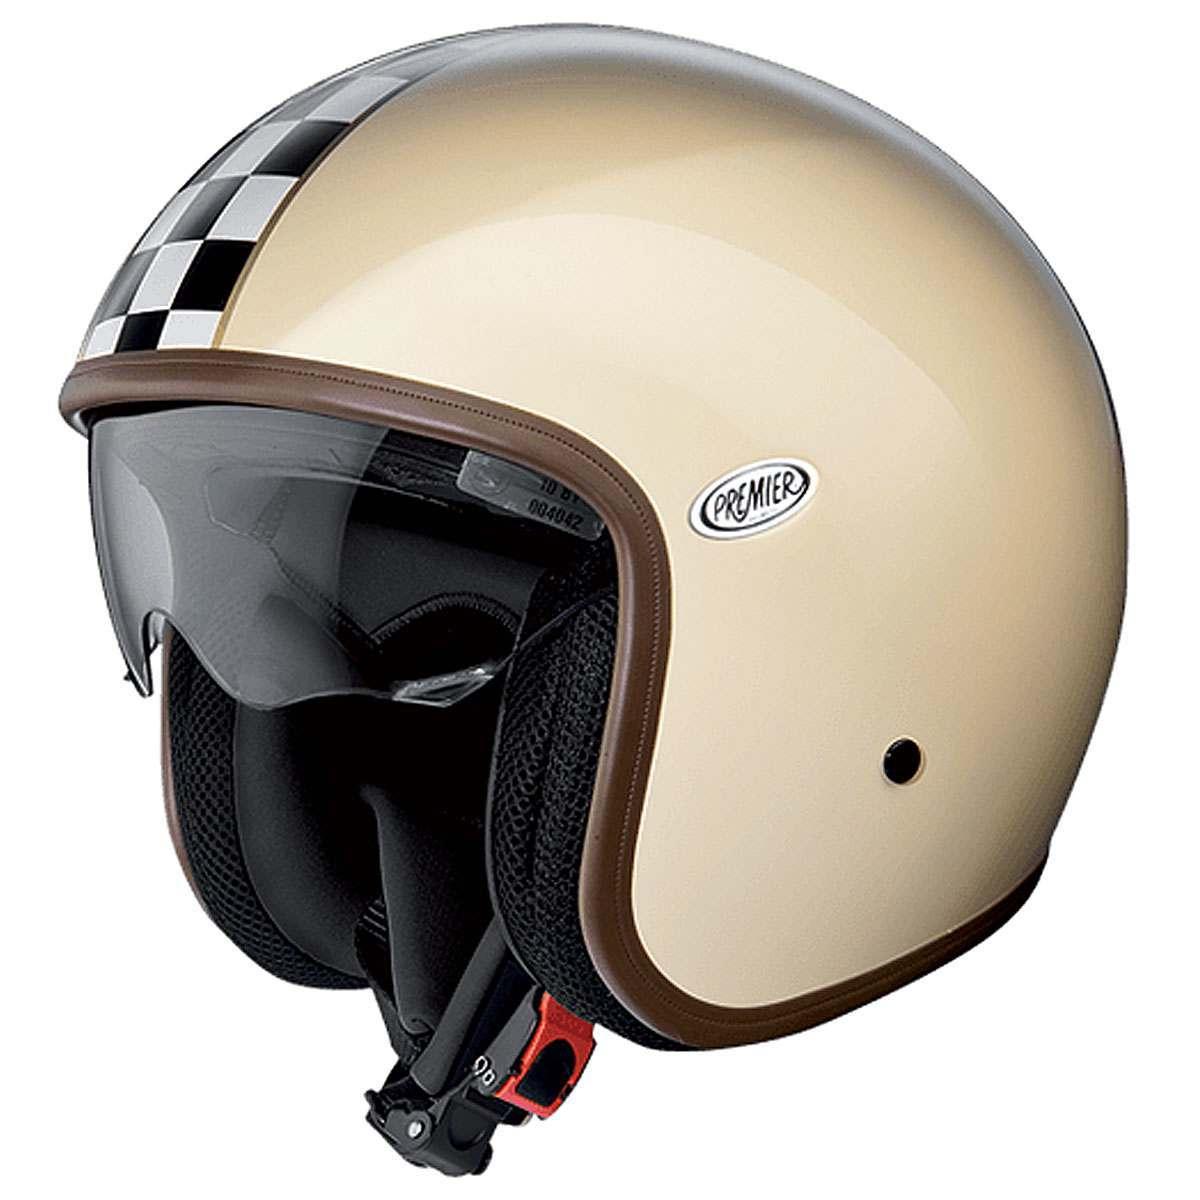 Premier Jet Vintage Helmet